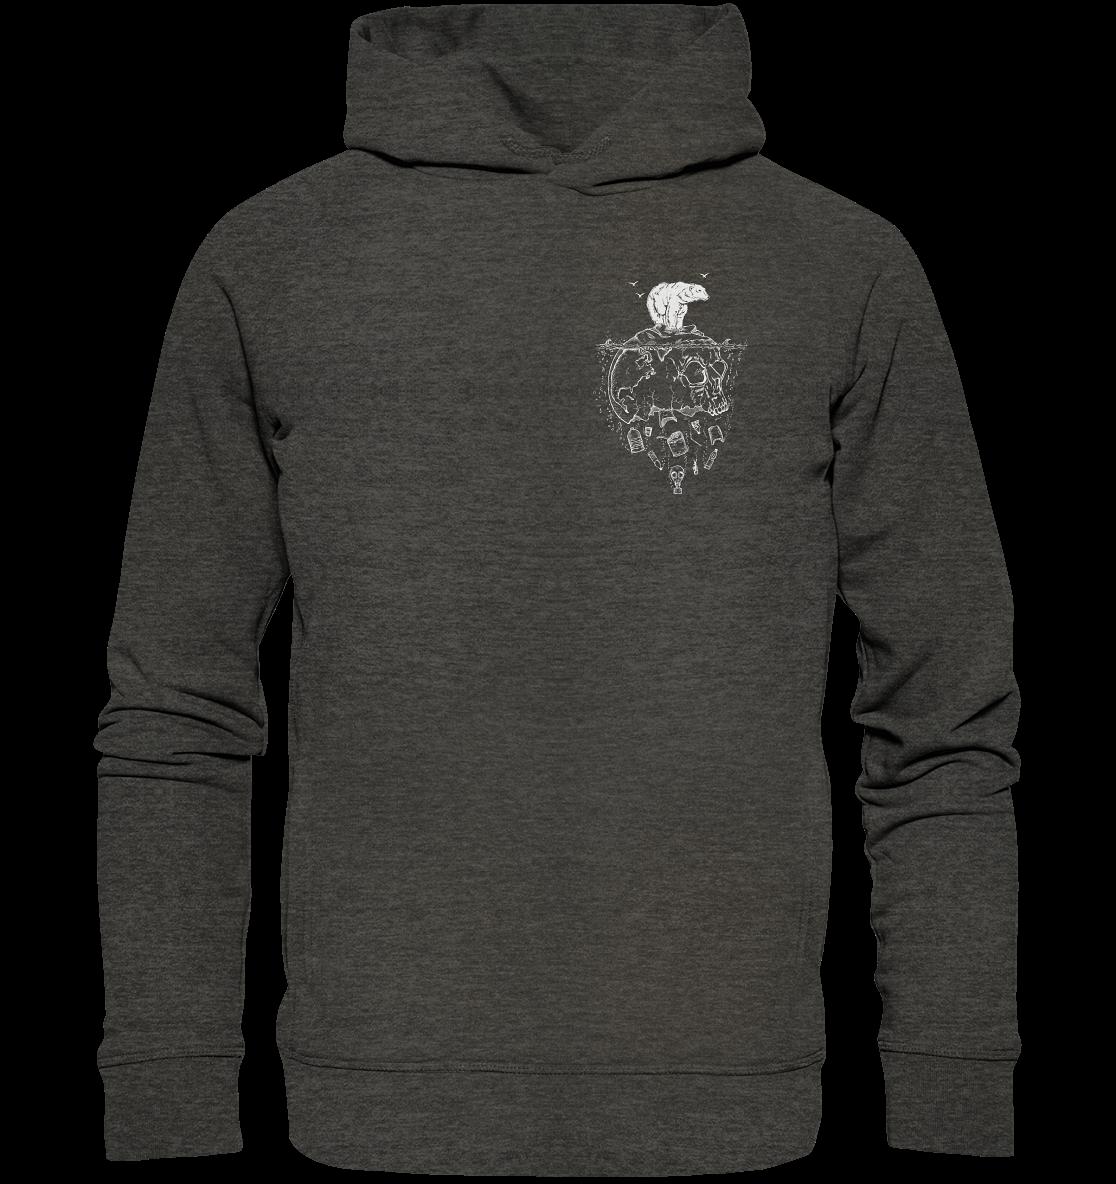 front-organic-fashion-hoodie-252625-1116x-16.png